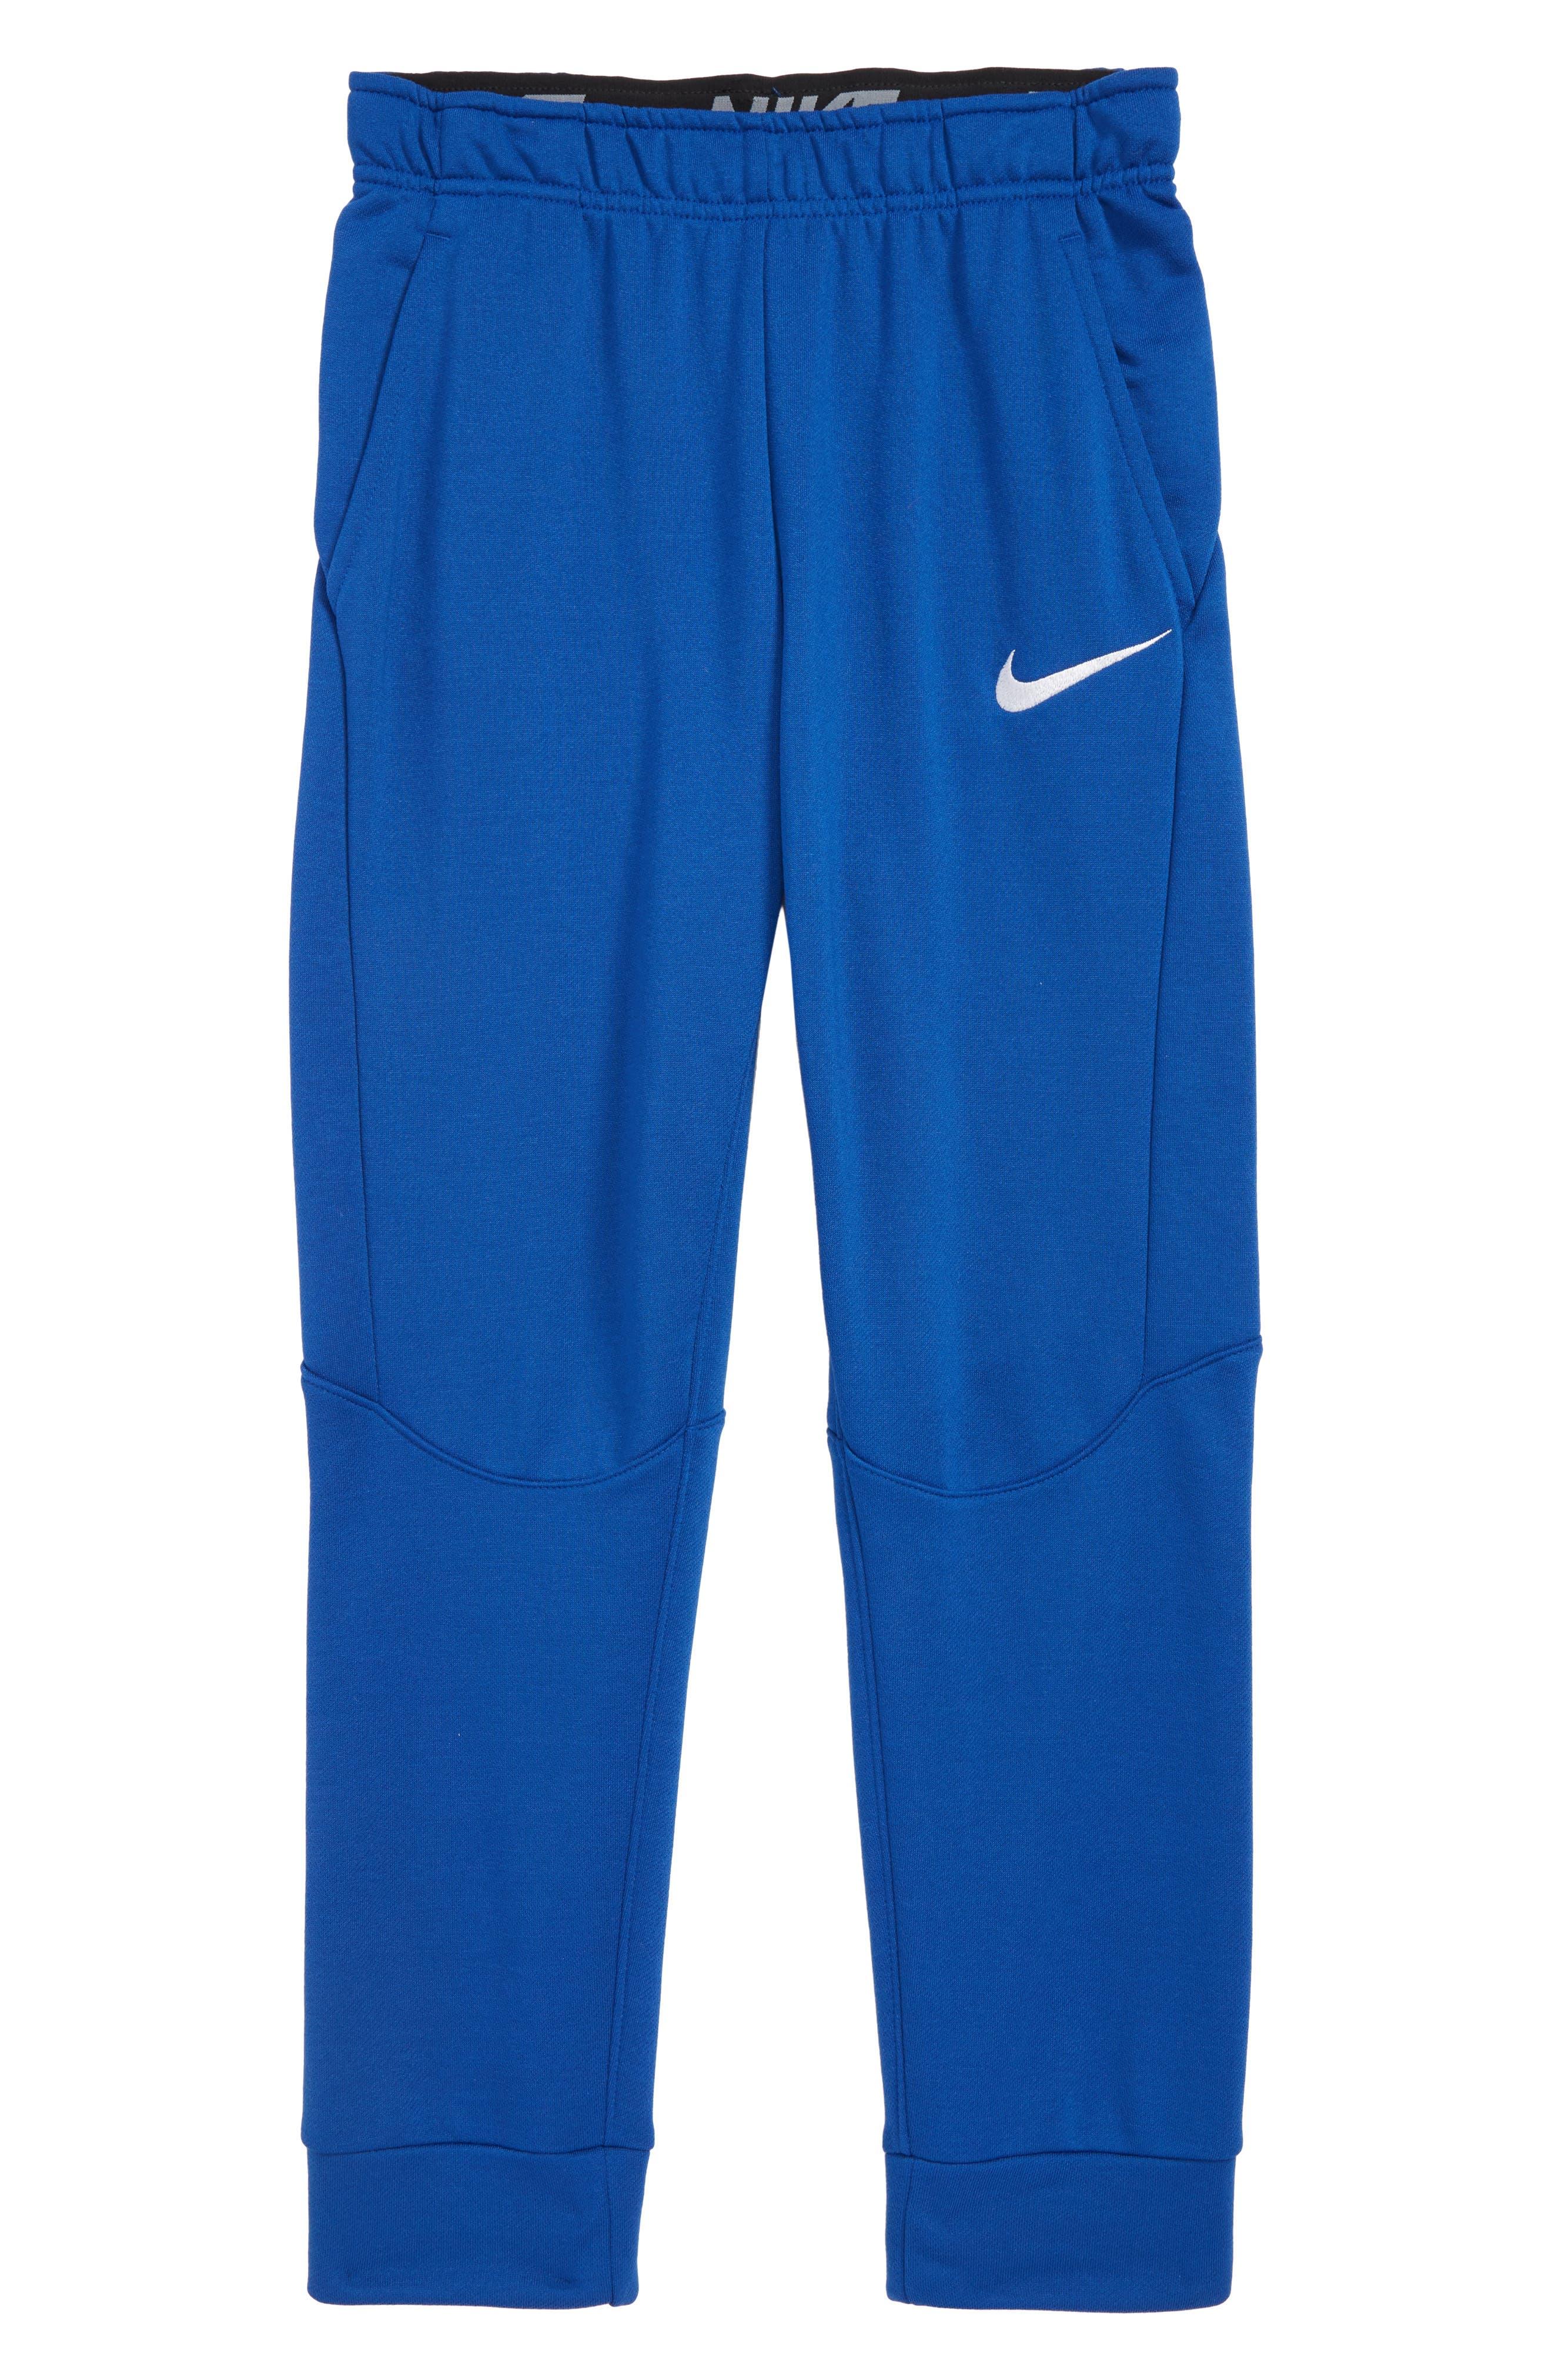 NIKE Dry Fleece Training Pants, Main, color, INDIGO FORCE/ WHITE